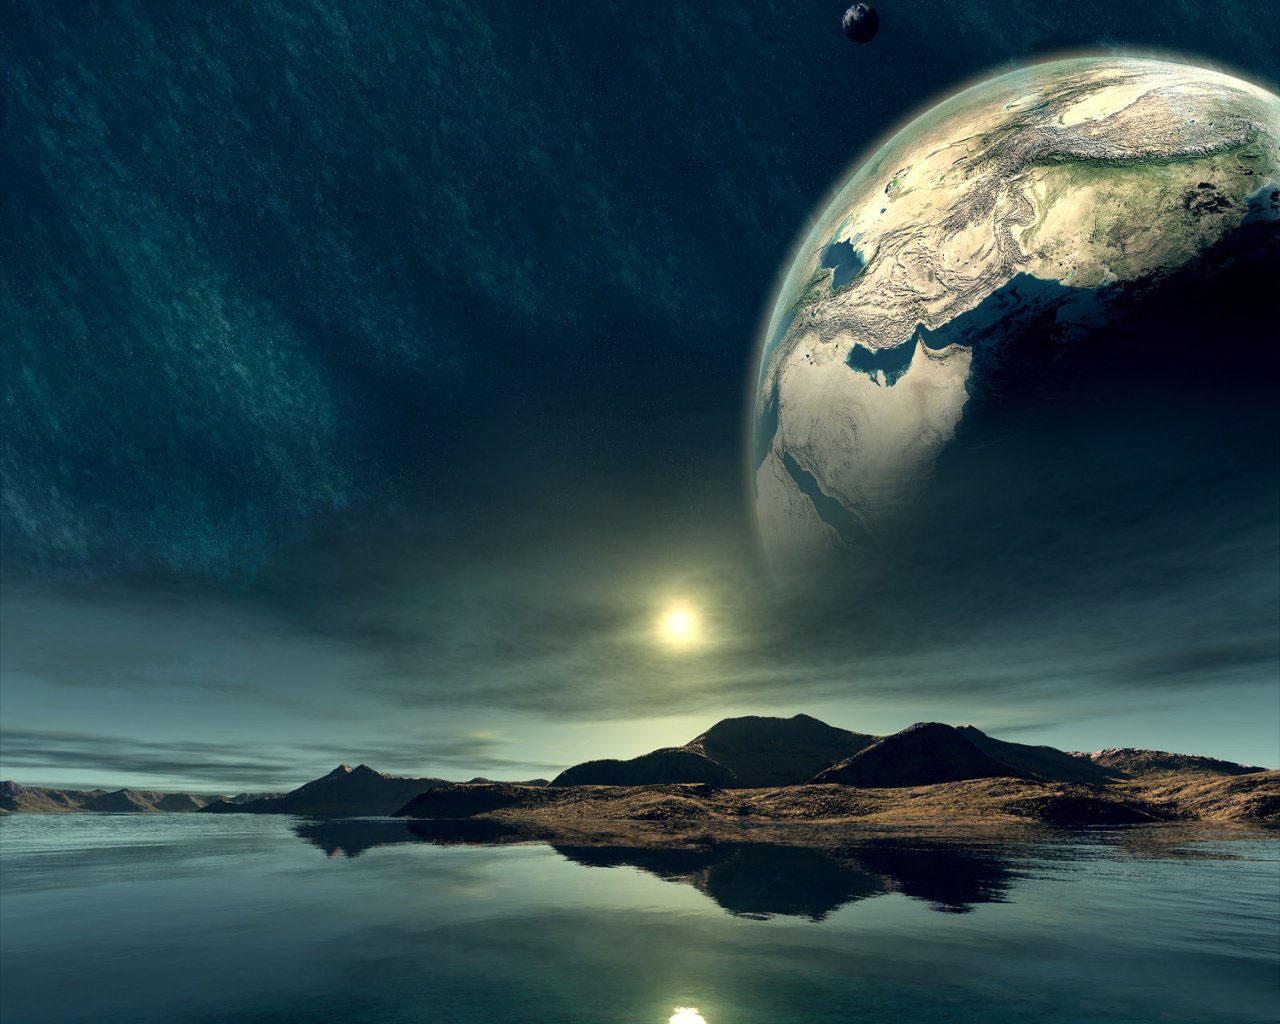 Dream world wallpaper